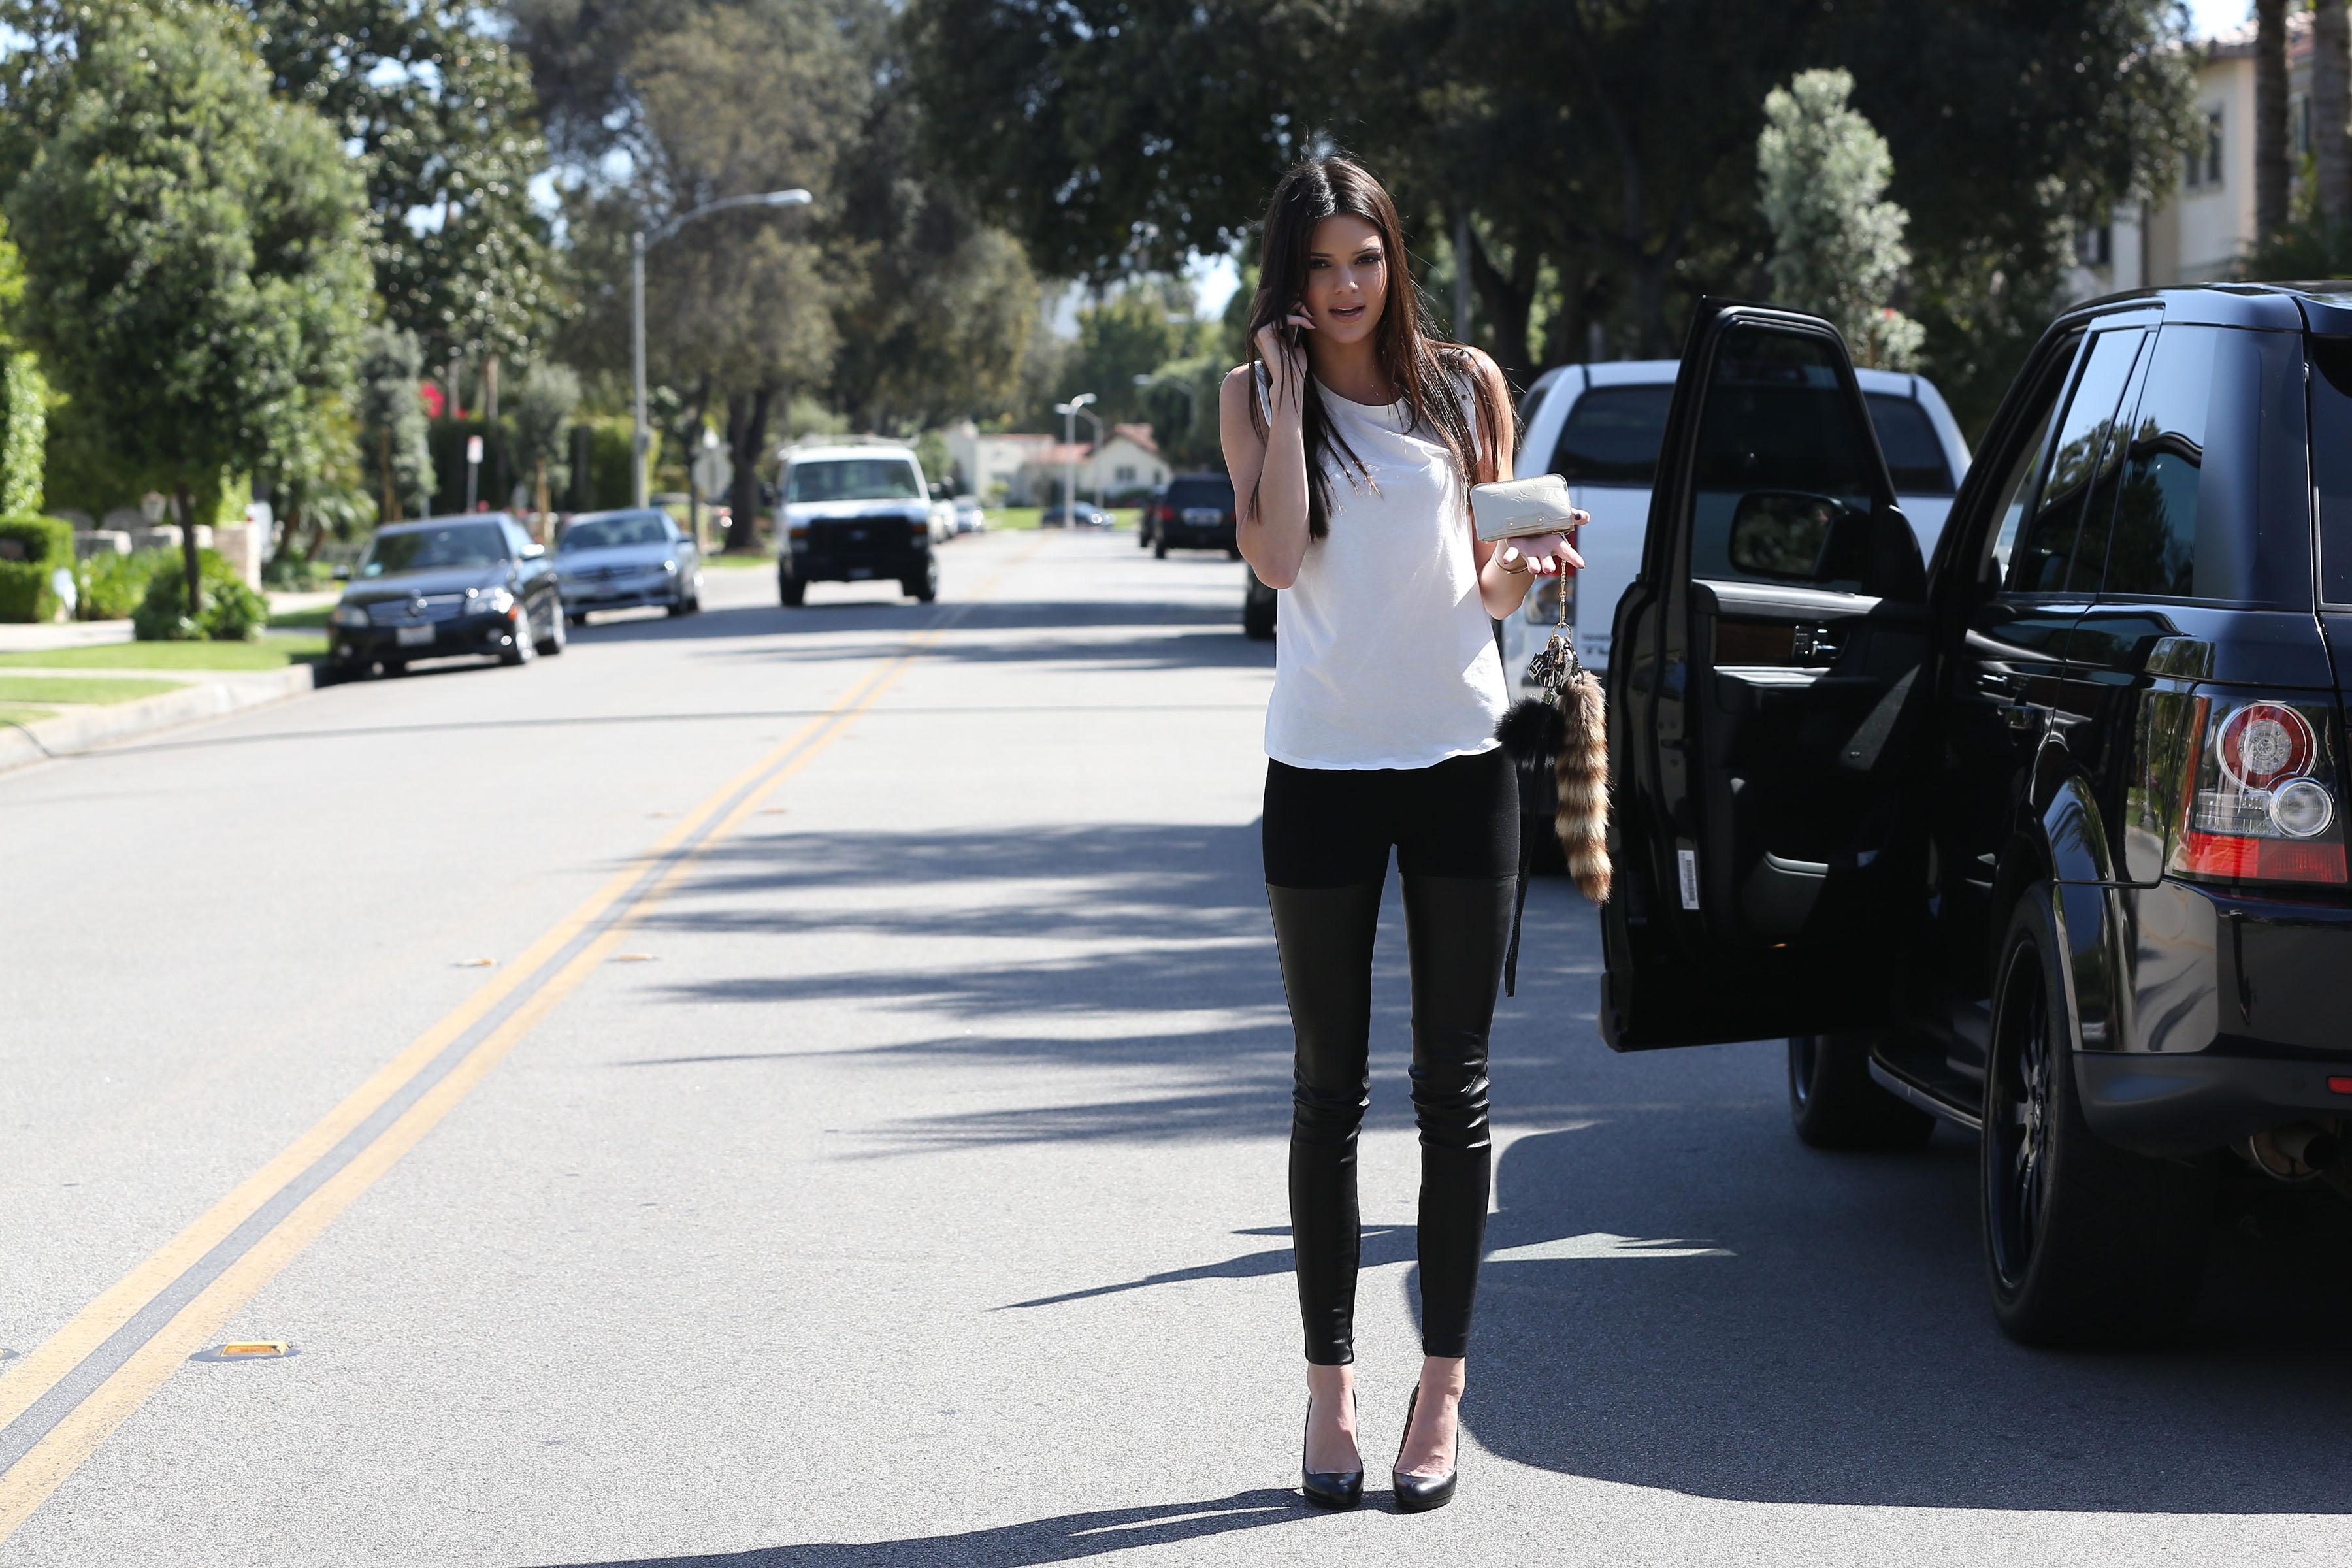 44626_Kendall_Jenner_LosAngelesApril112013_J0001_021_122_254lo.jpg